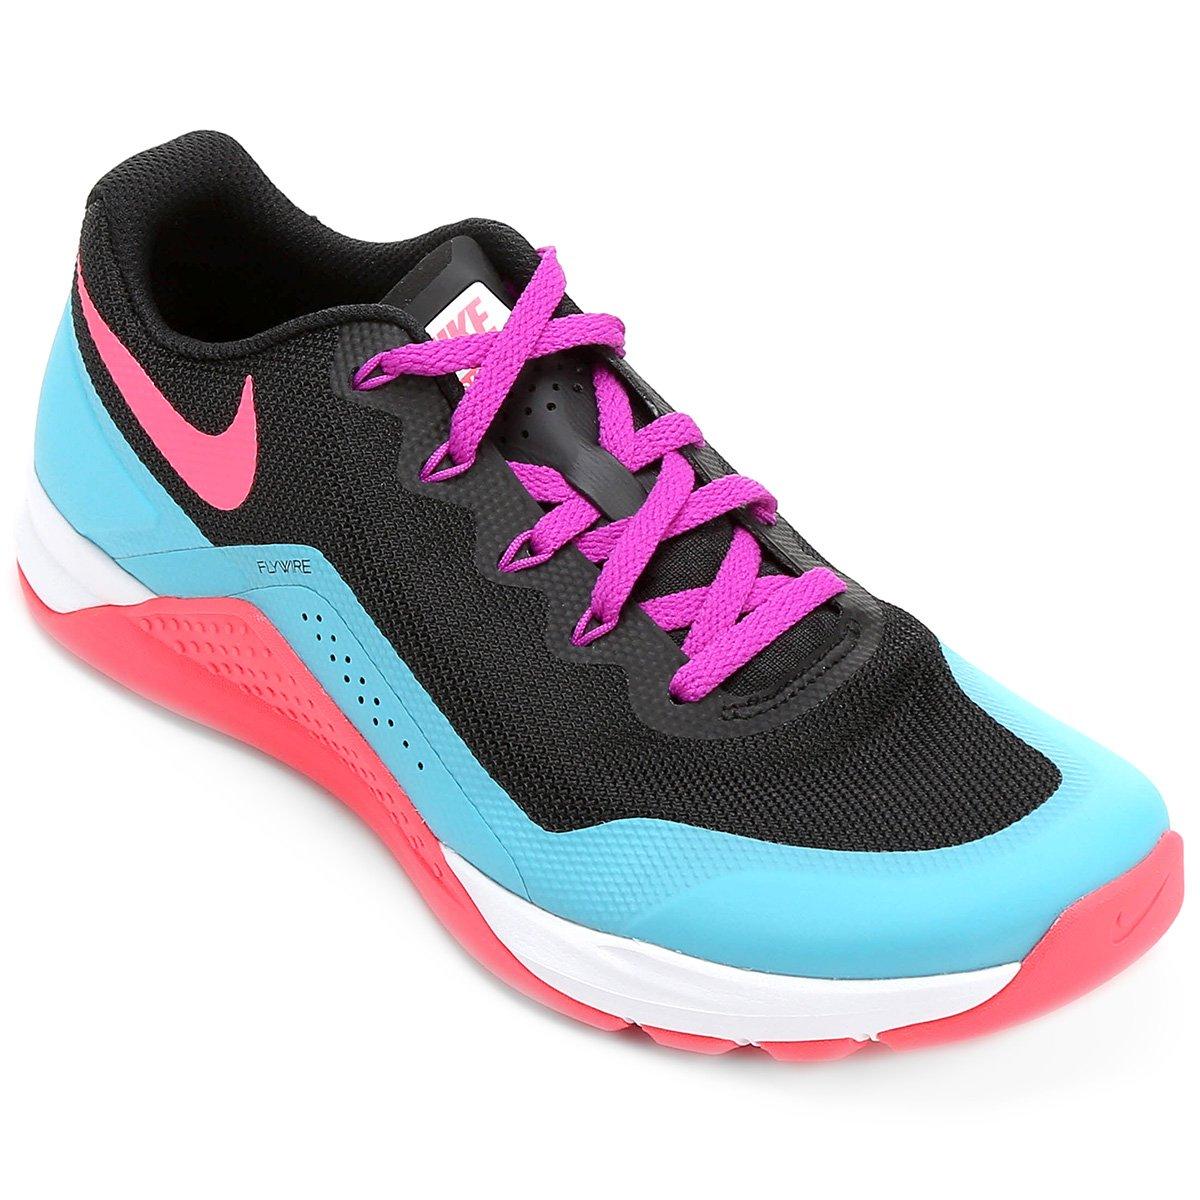 Tênis Nike Metcon Repper DSX Feminino - Preto e Rosa - Compre Agora ... 20f163c35b122